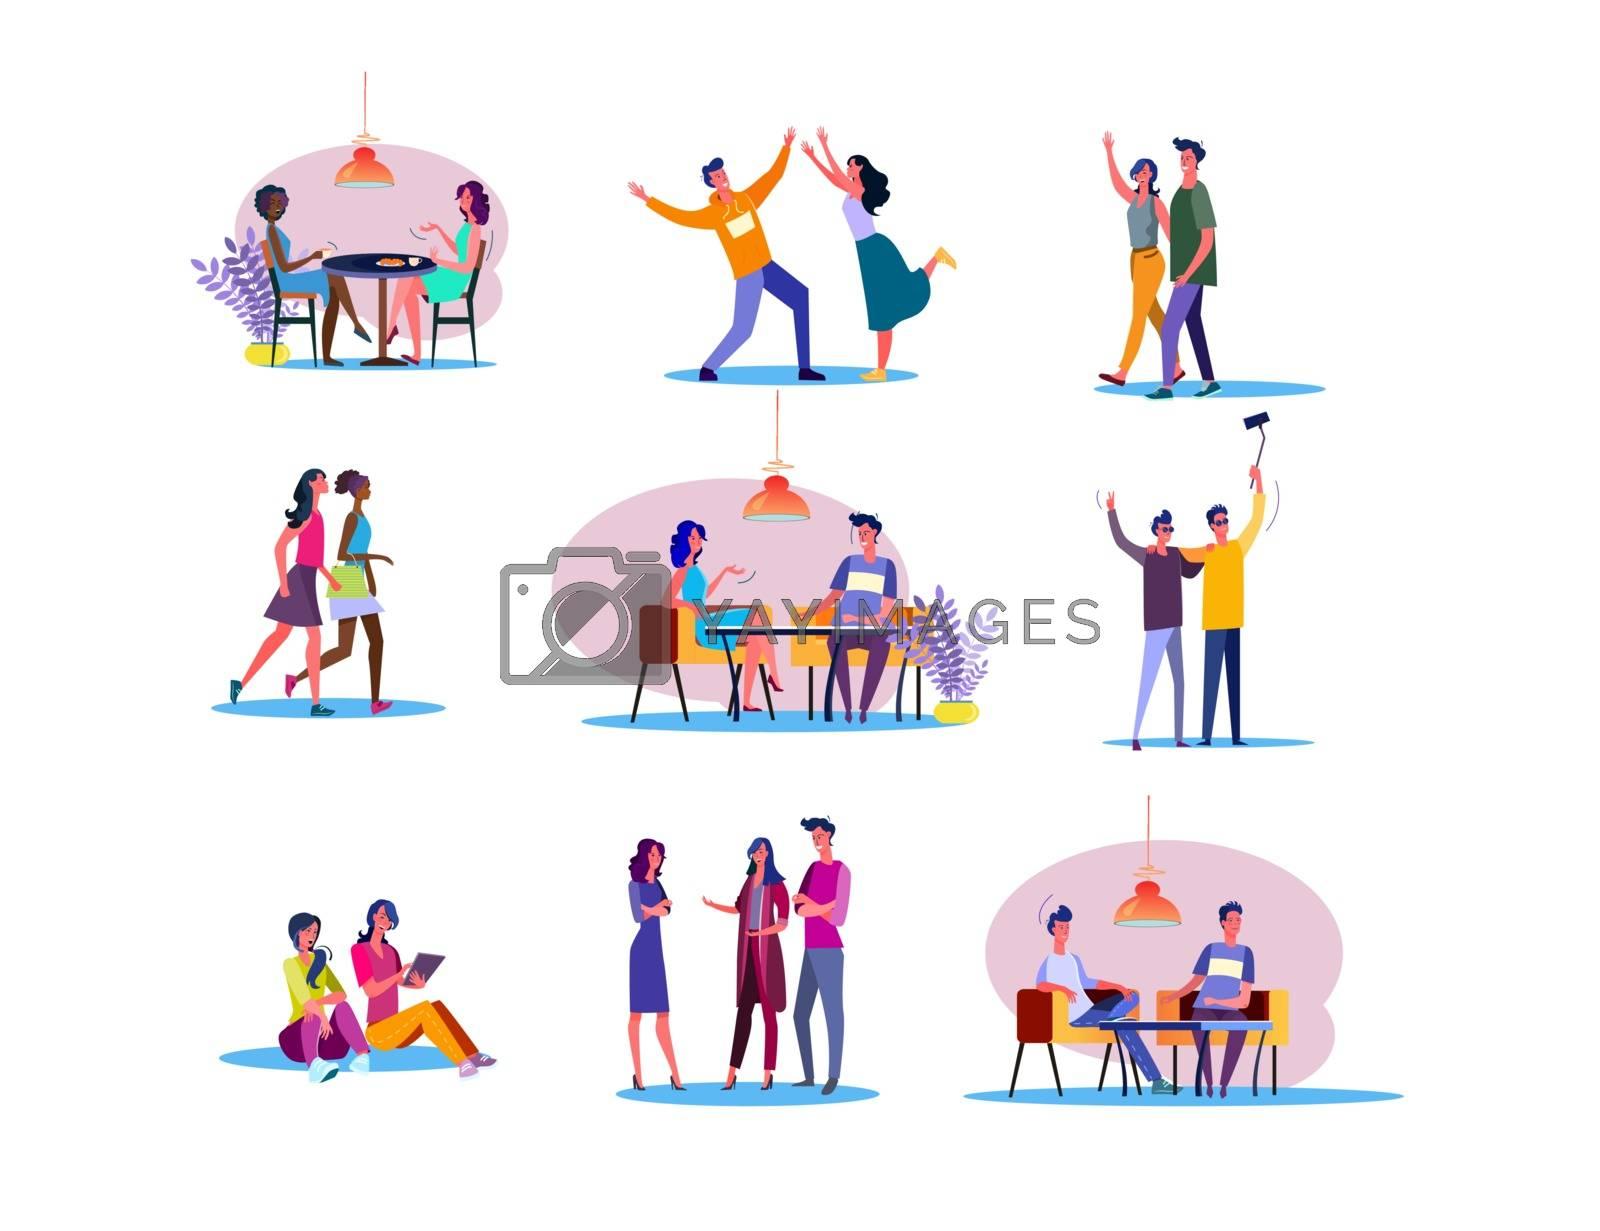 Happy friends set. Men and women eating in cafe, dancing, doing shopping, taking selfie together. Flat vector illustrations. Friendship concept for banner, website design or landing web page